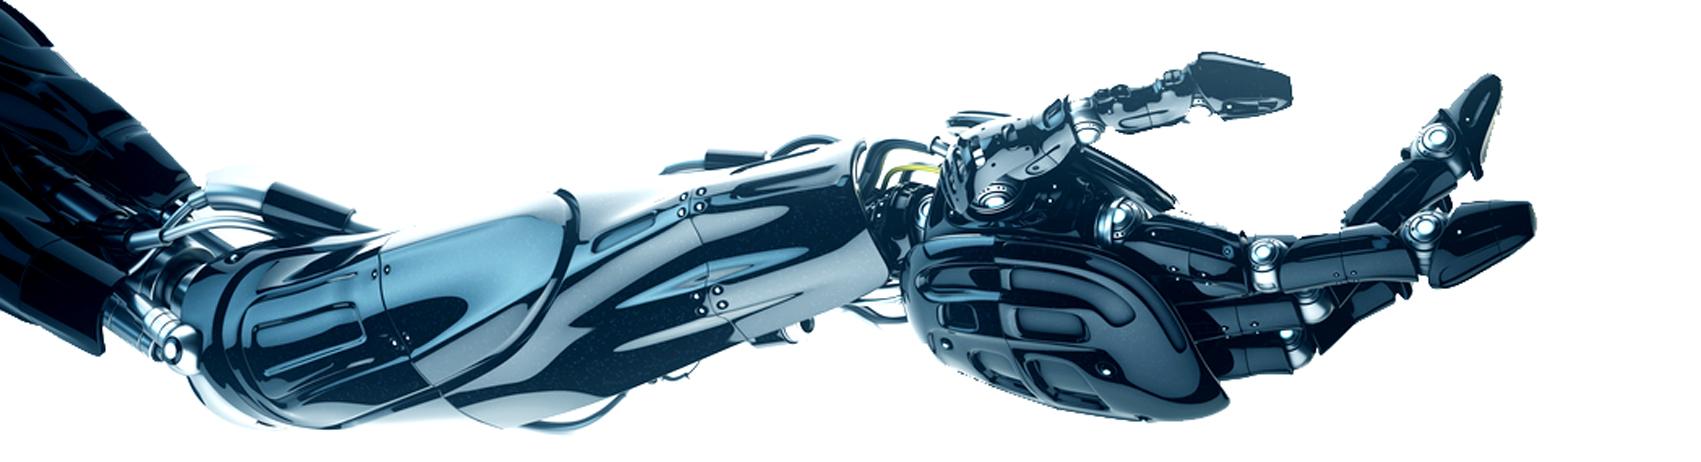 motores de continua en robótica